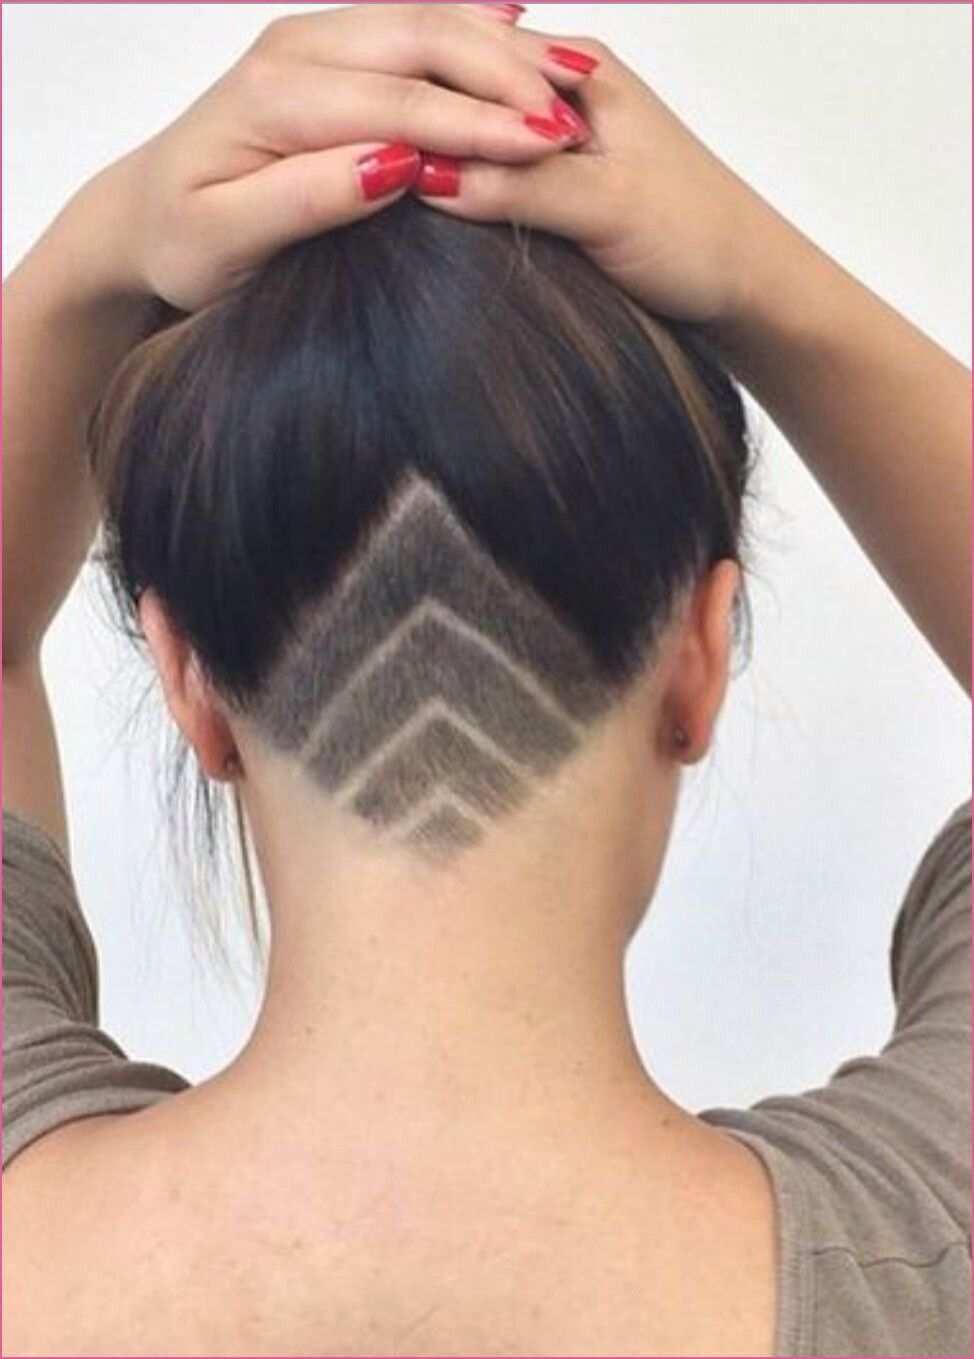 Nett Undercut Frauen Nacken Muster Undercut Frauen Lange Haare Undercut Frisuren Damen Undercut Frau